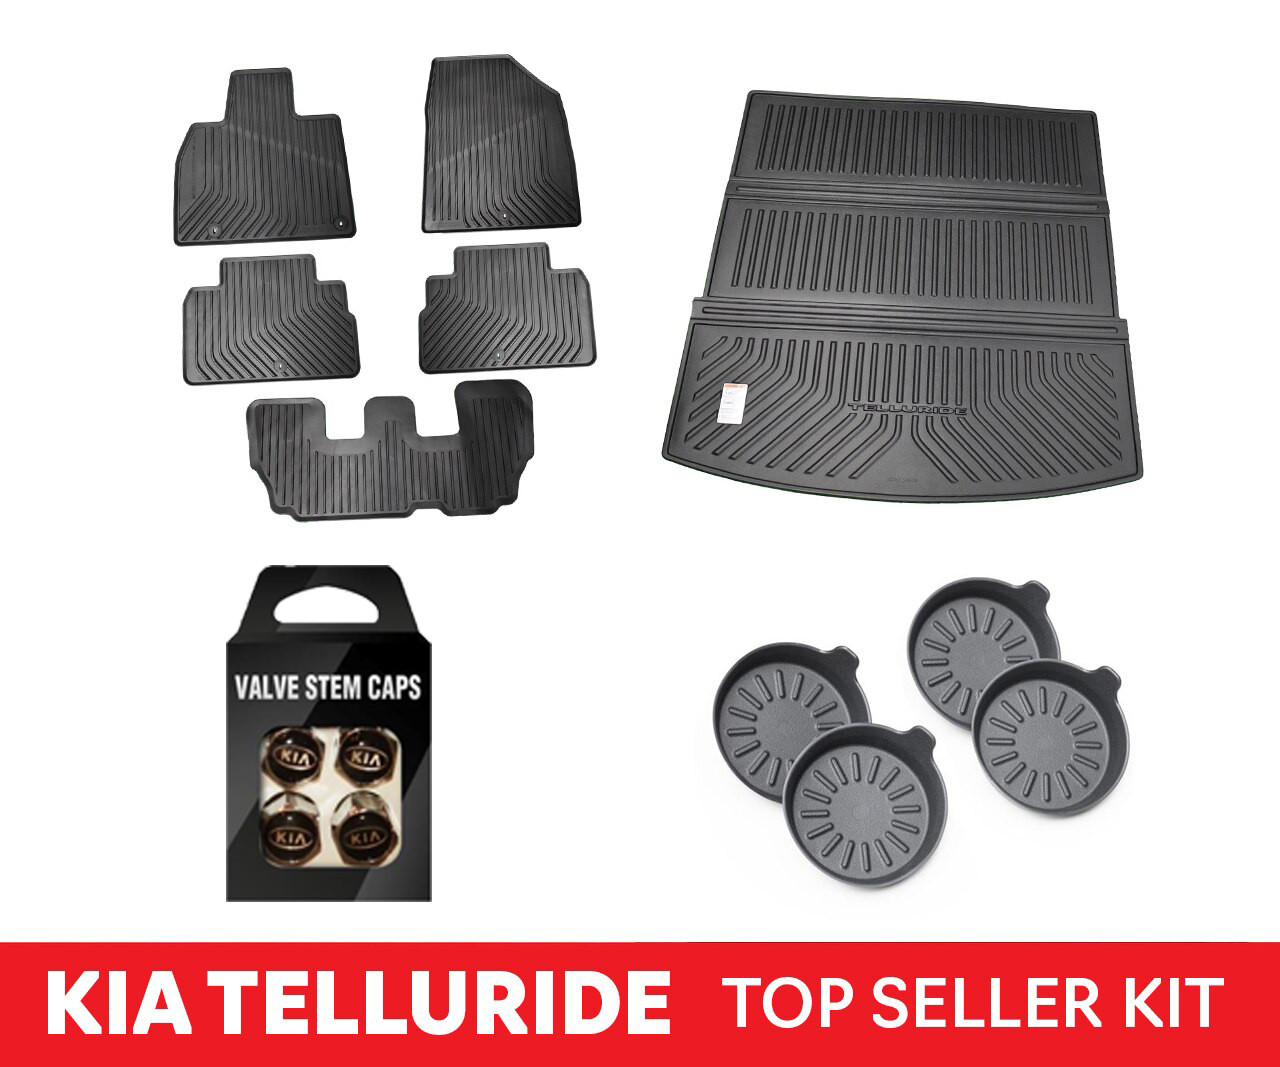 2020-2022 Top Selling Kia Telluride Accessories Kit